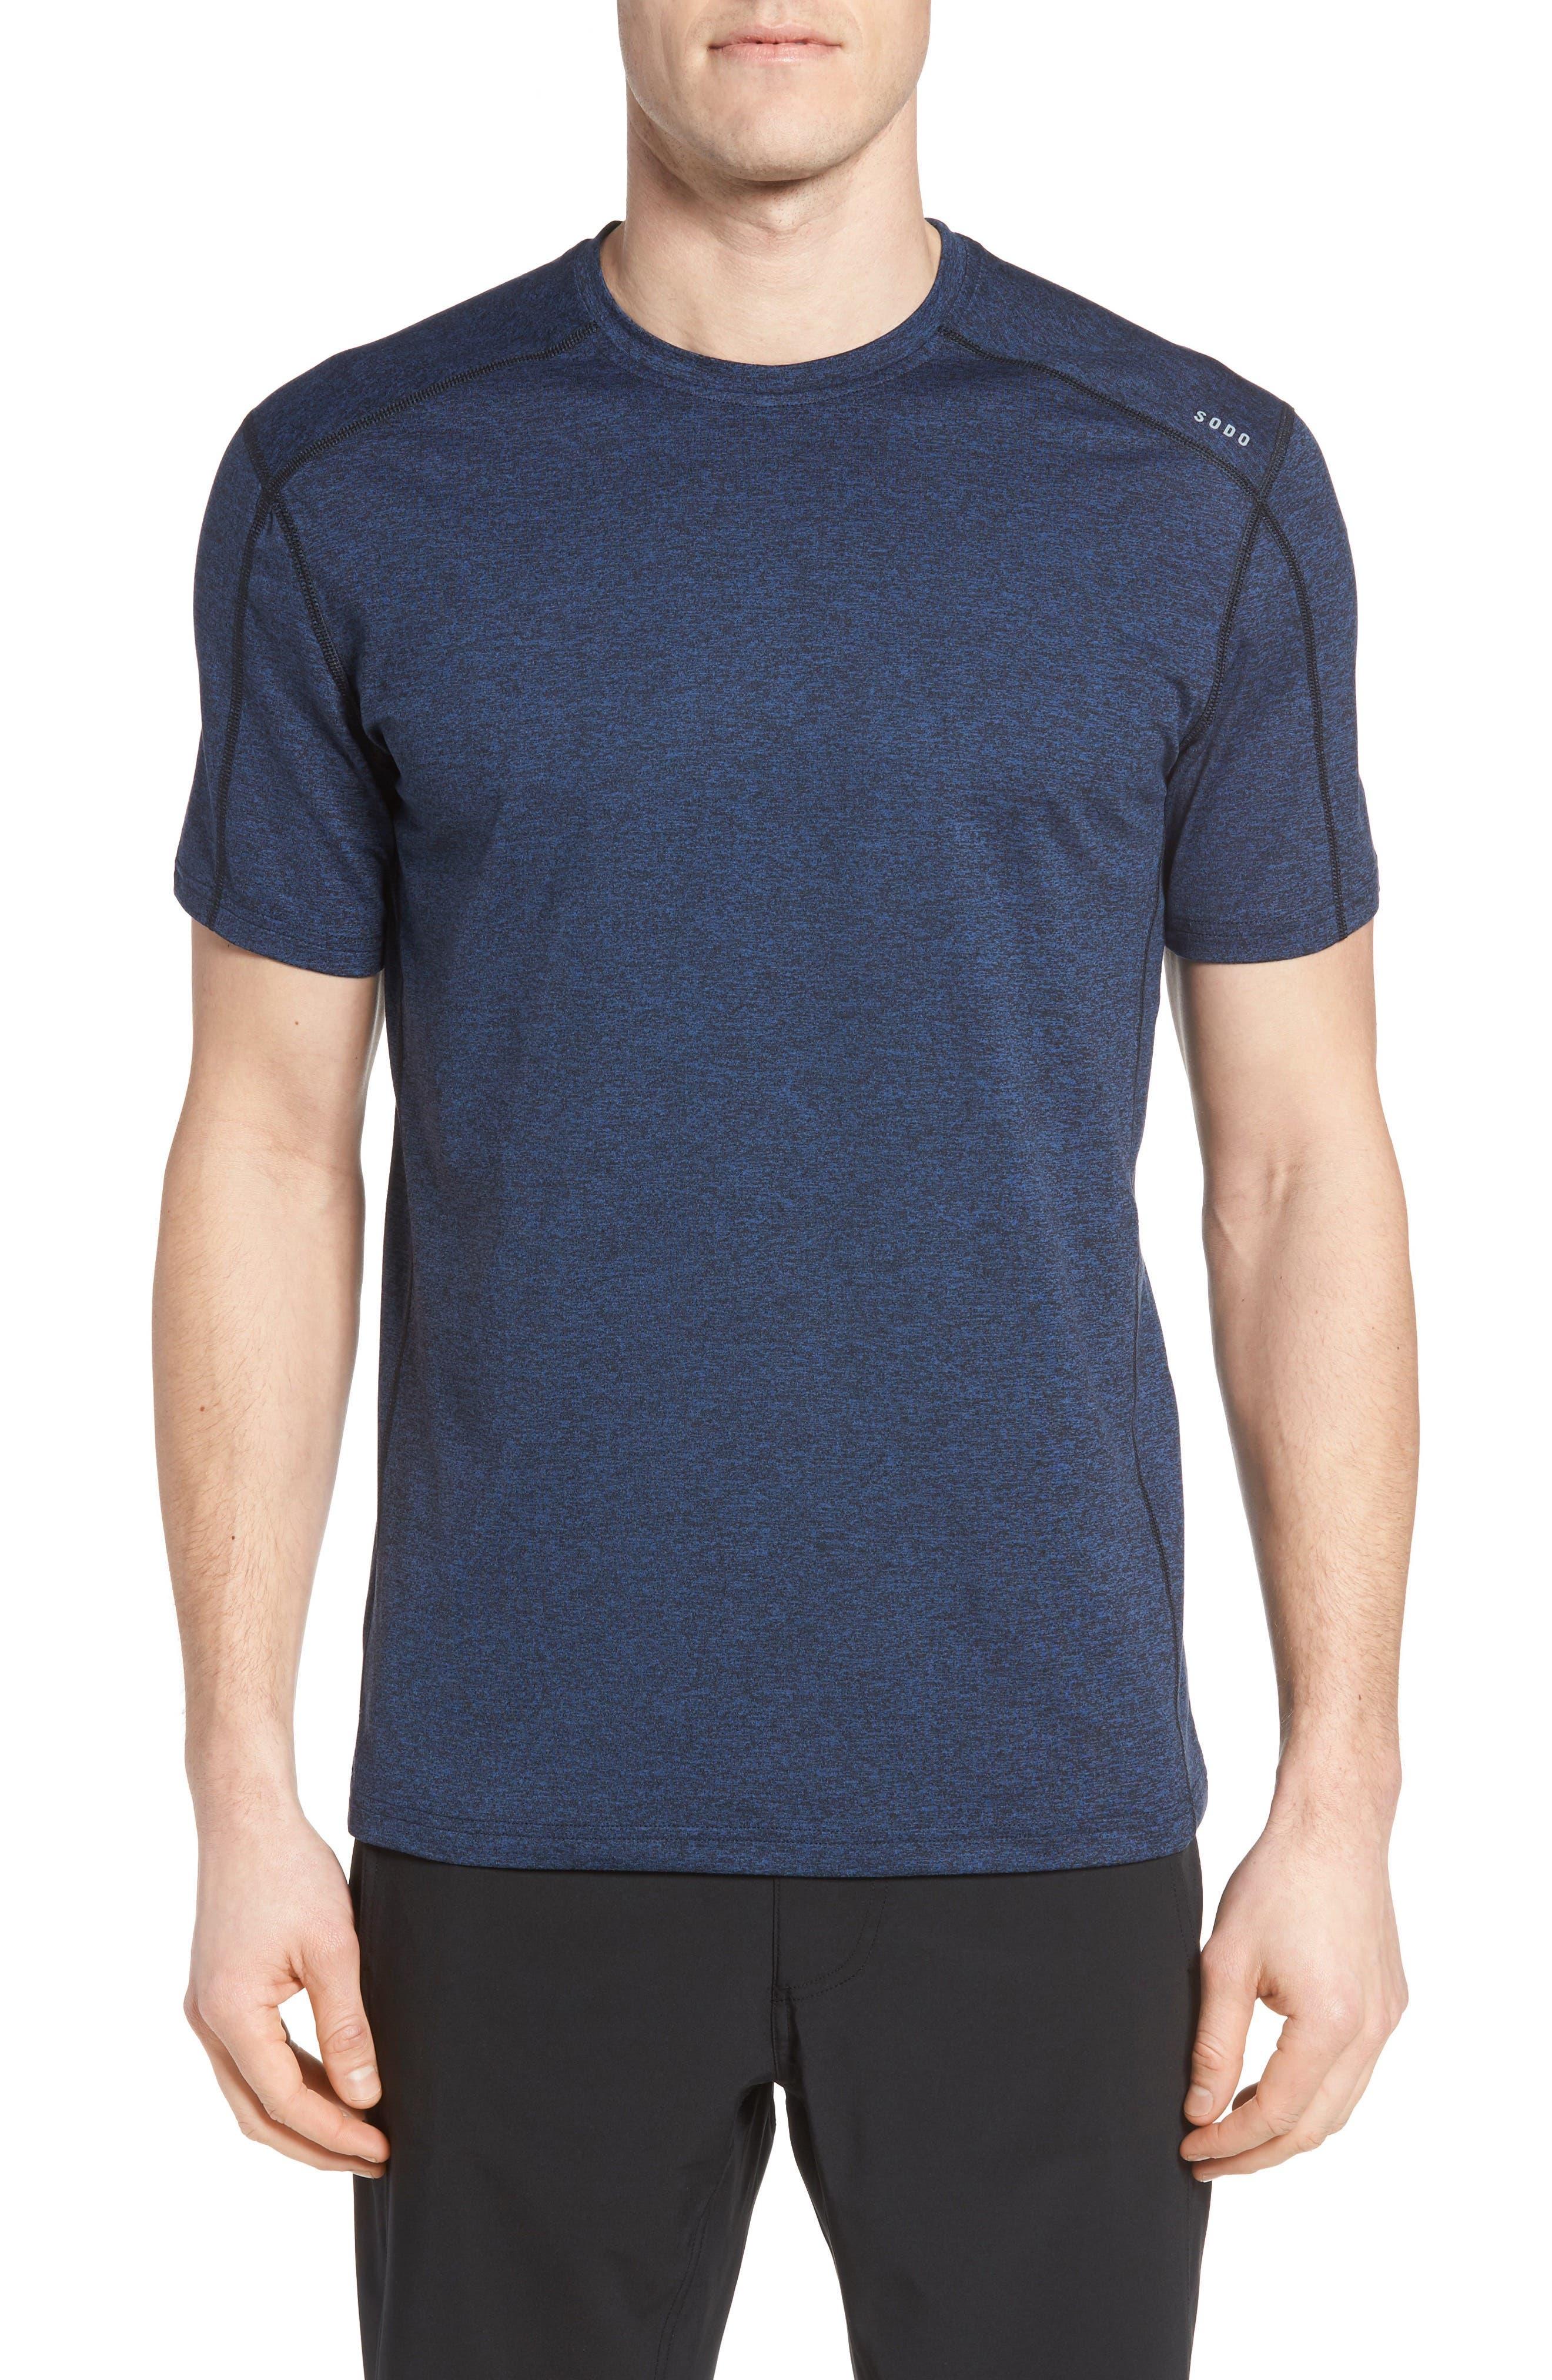 SODO 'Cooldown' Moisture Wicking Training T-Shirt